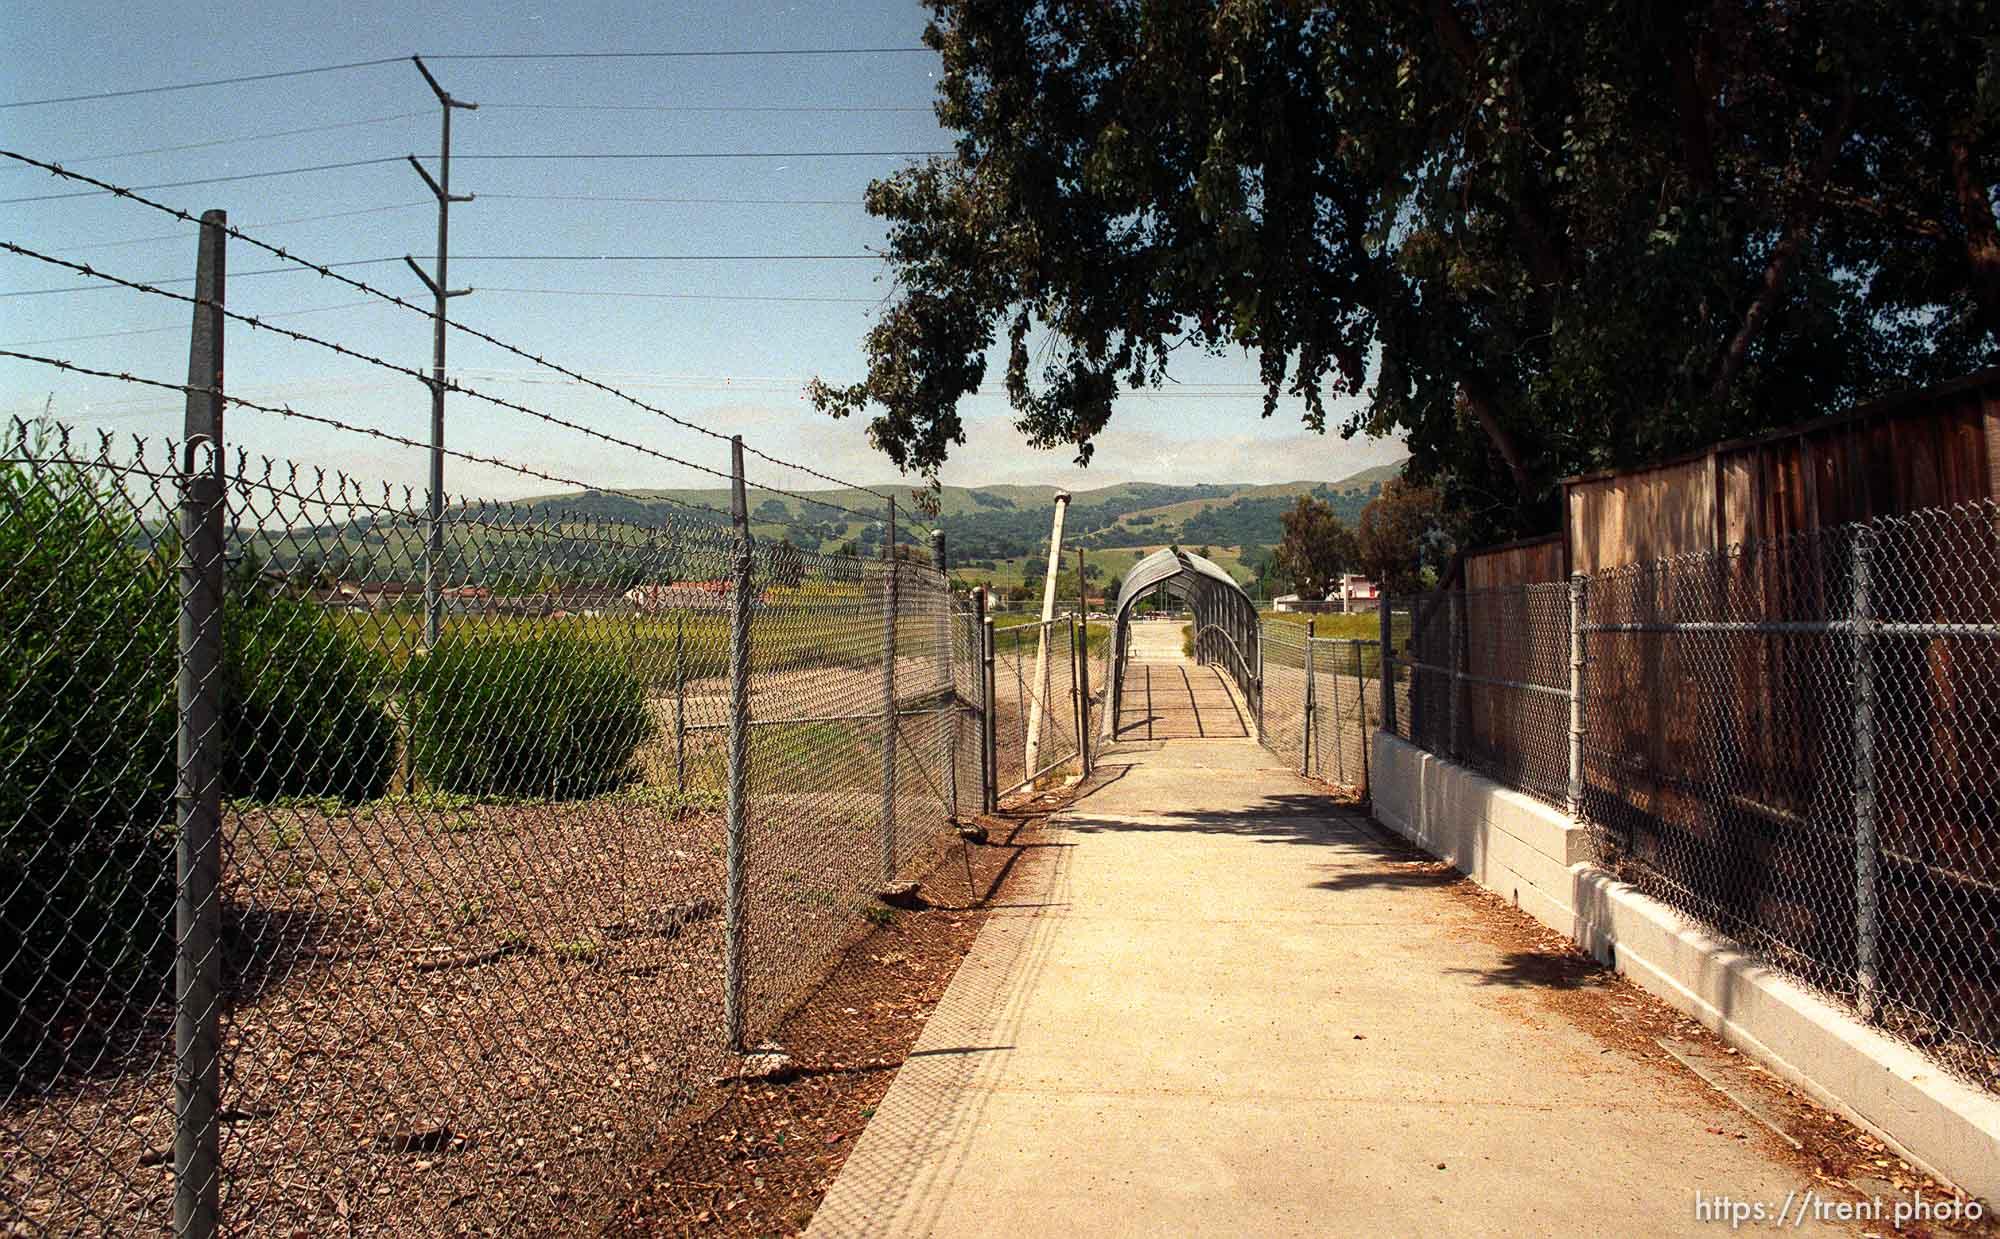 The bridge leading to California High School